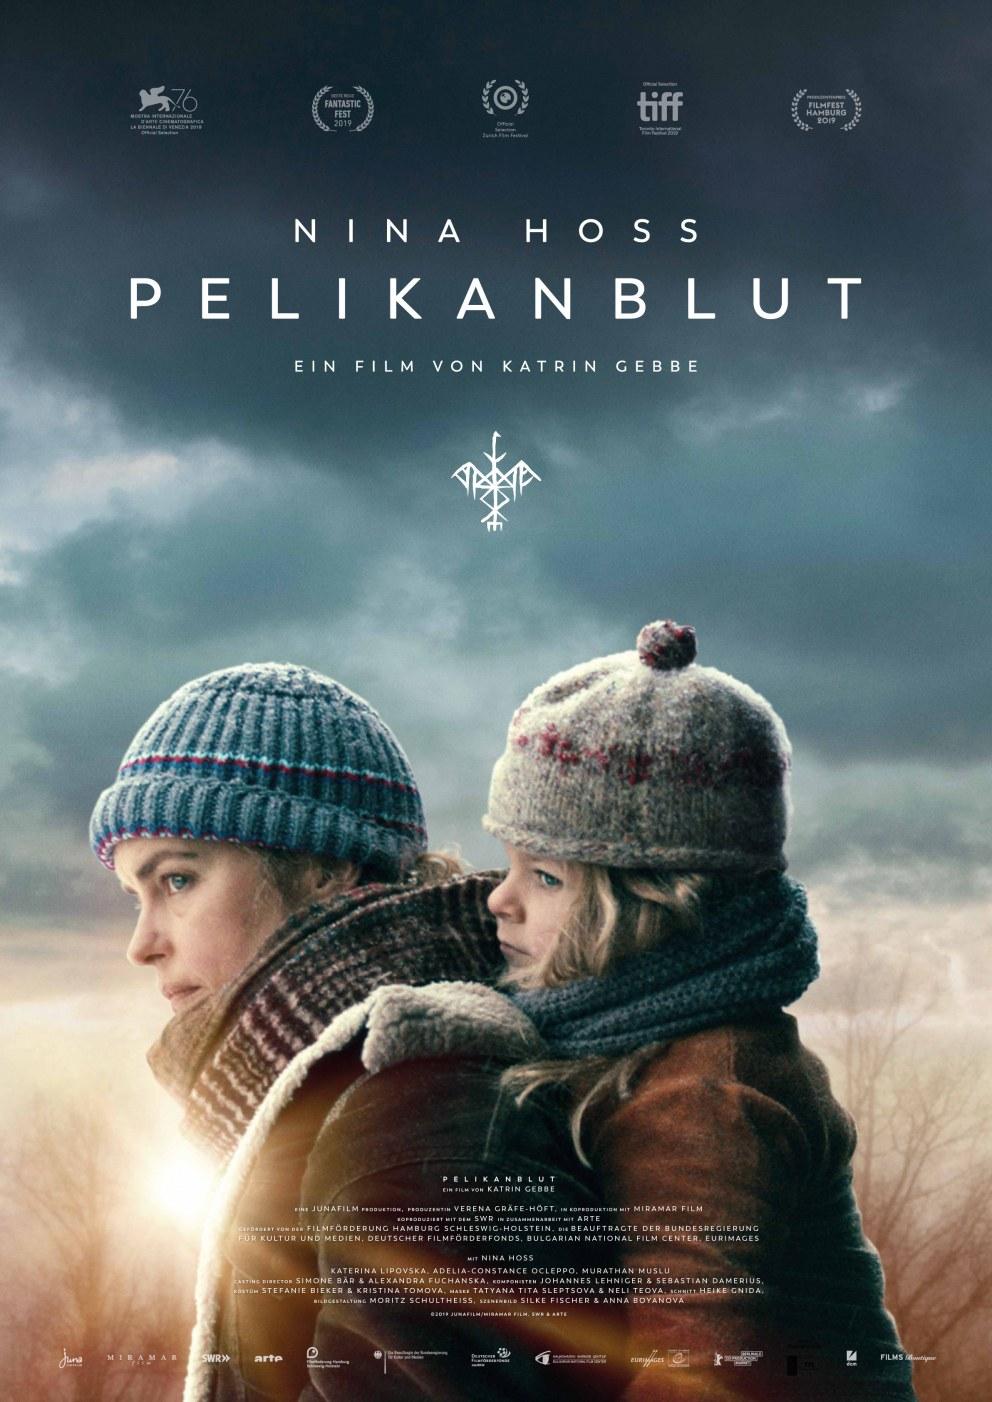 Kinoprogramm Cinestar Greifswald